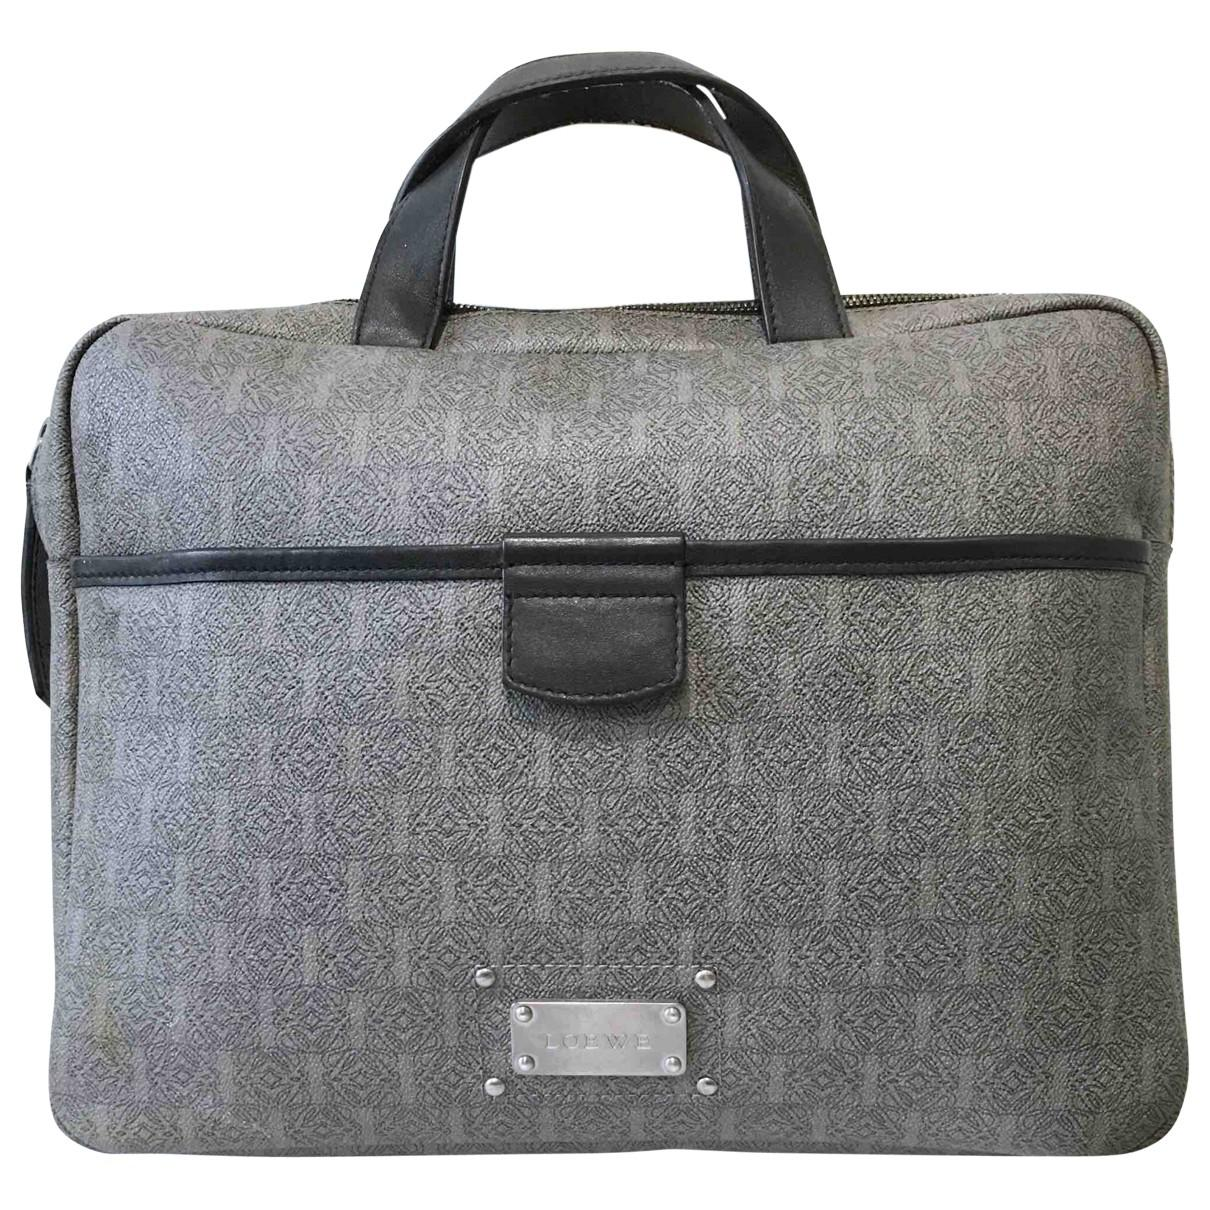 Pre-owned - Cloth handbag Loewe B7LxyoQ6